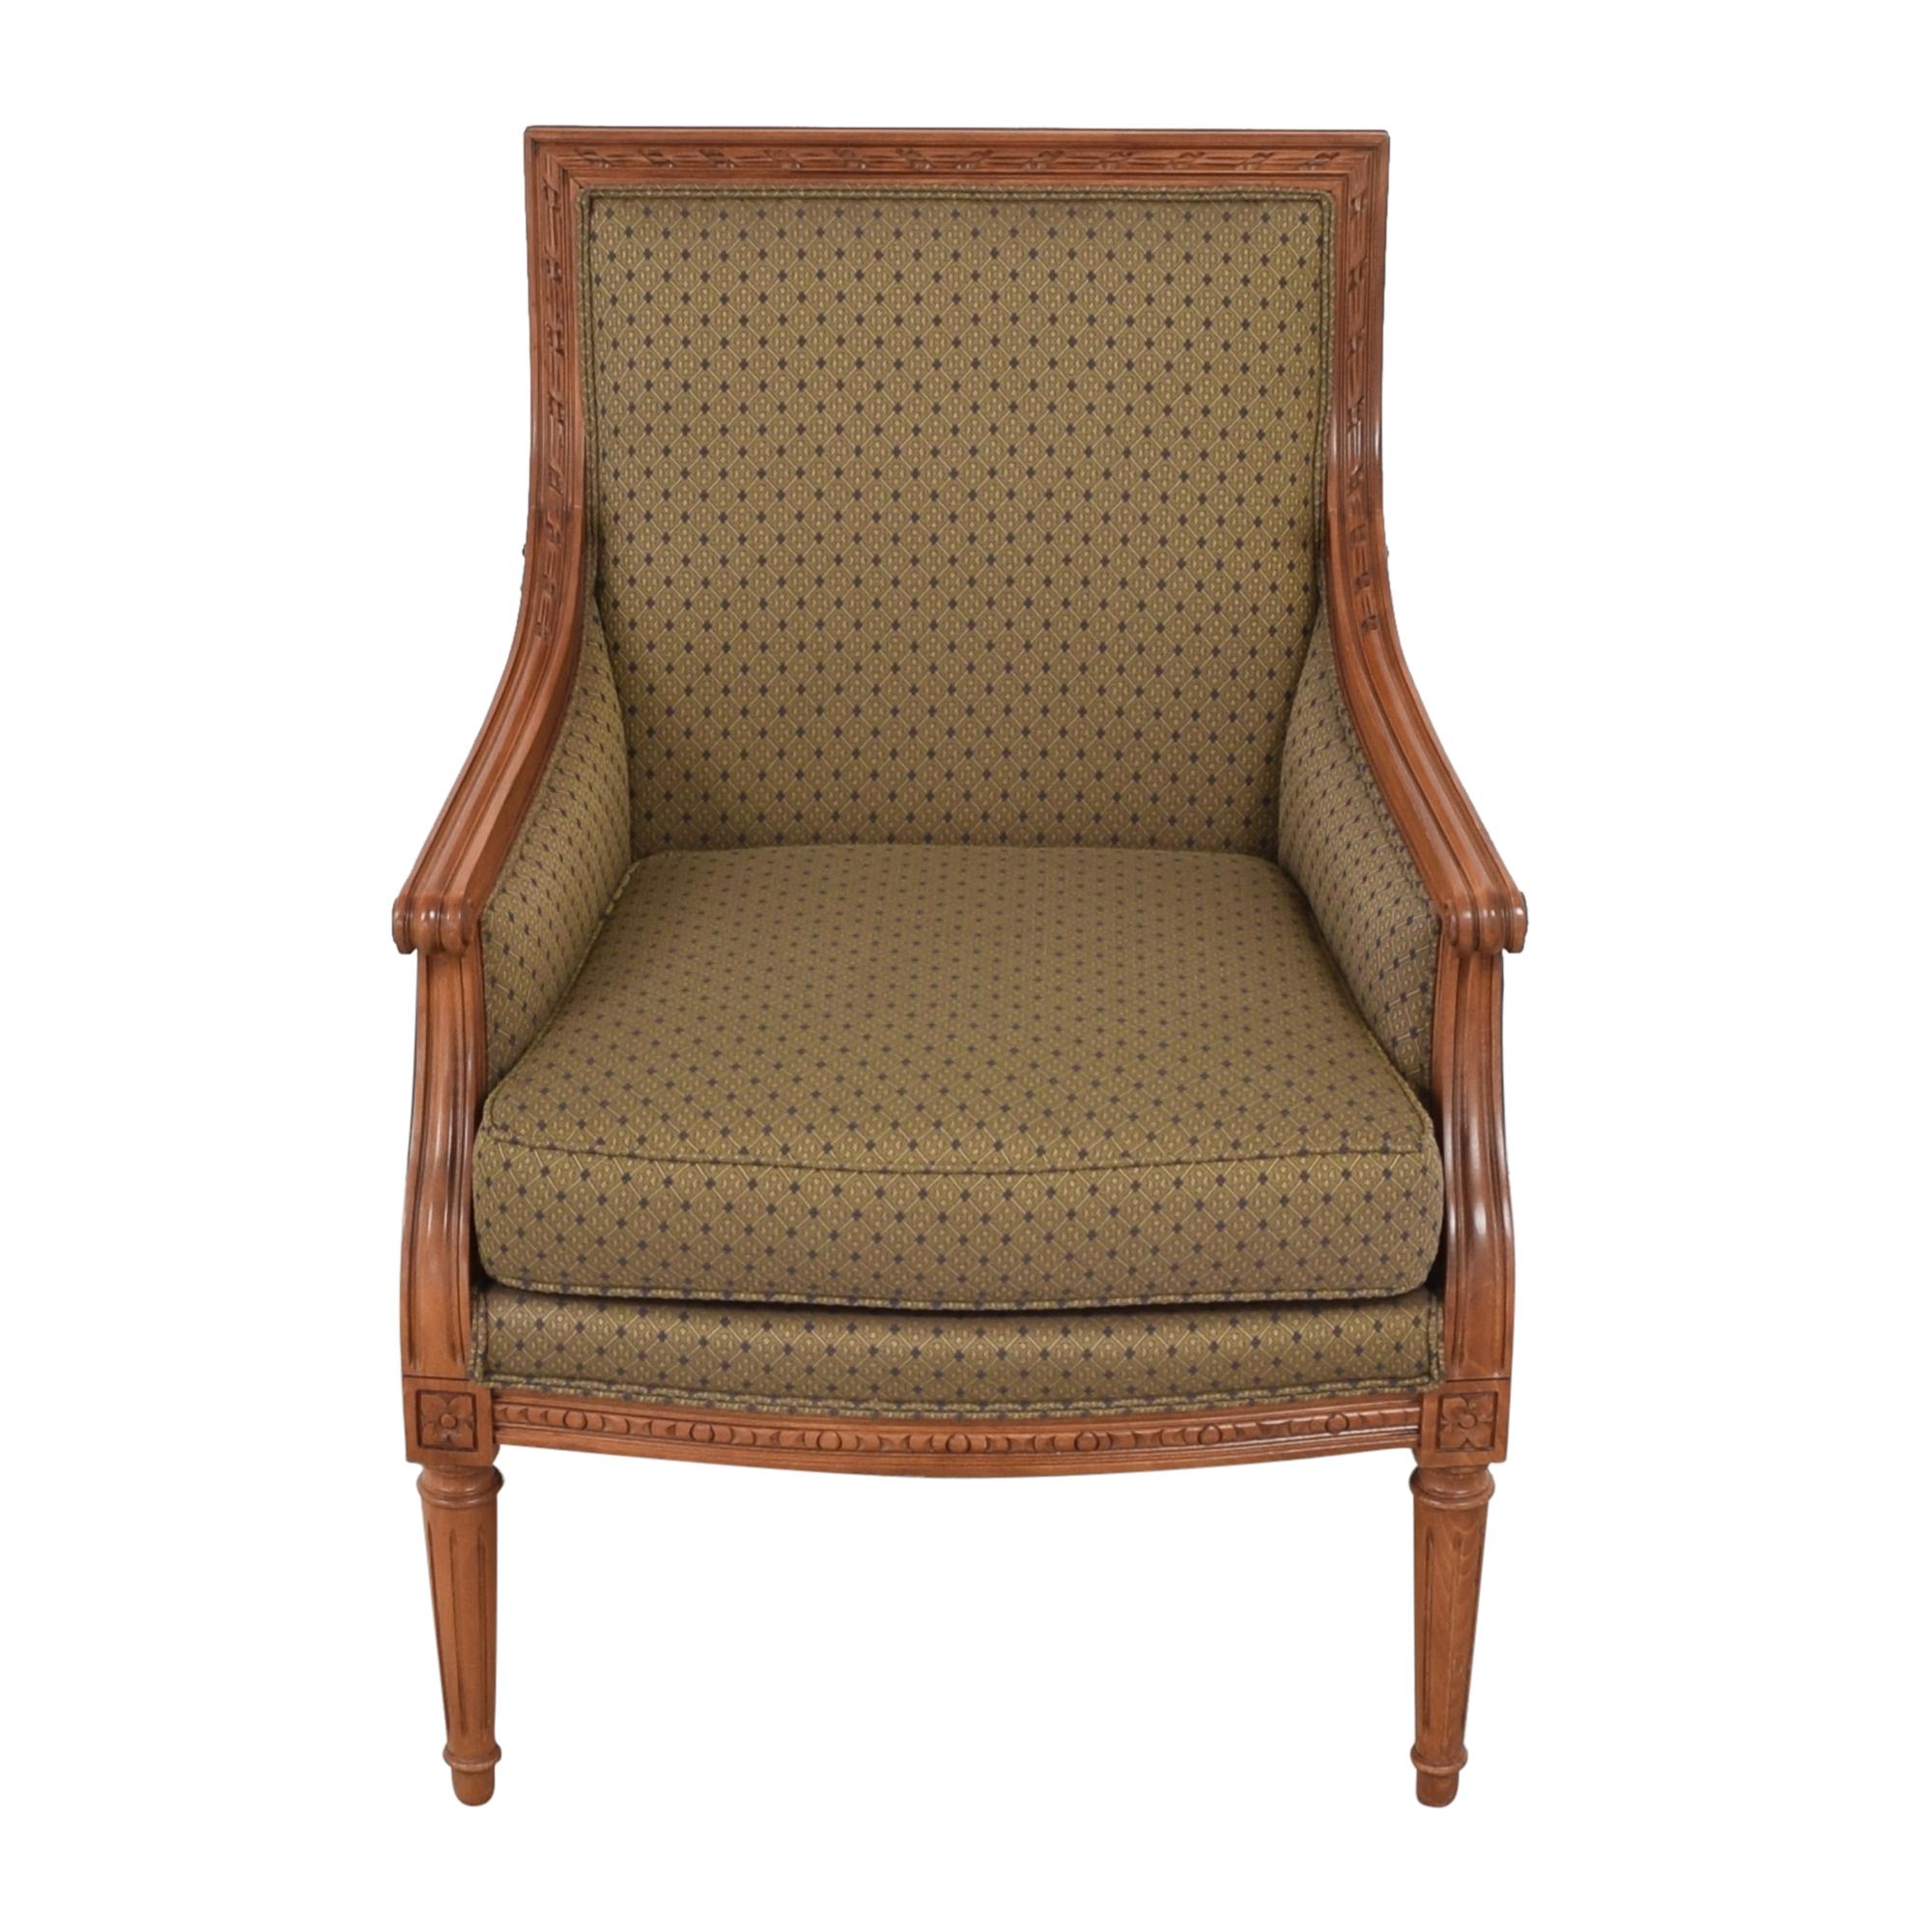 Ethan Allen Ethan Allen Gisele Chair pa